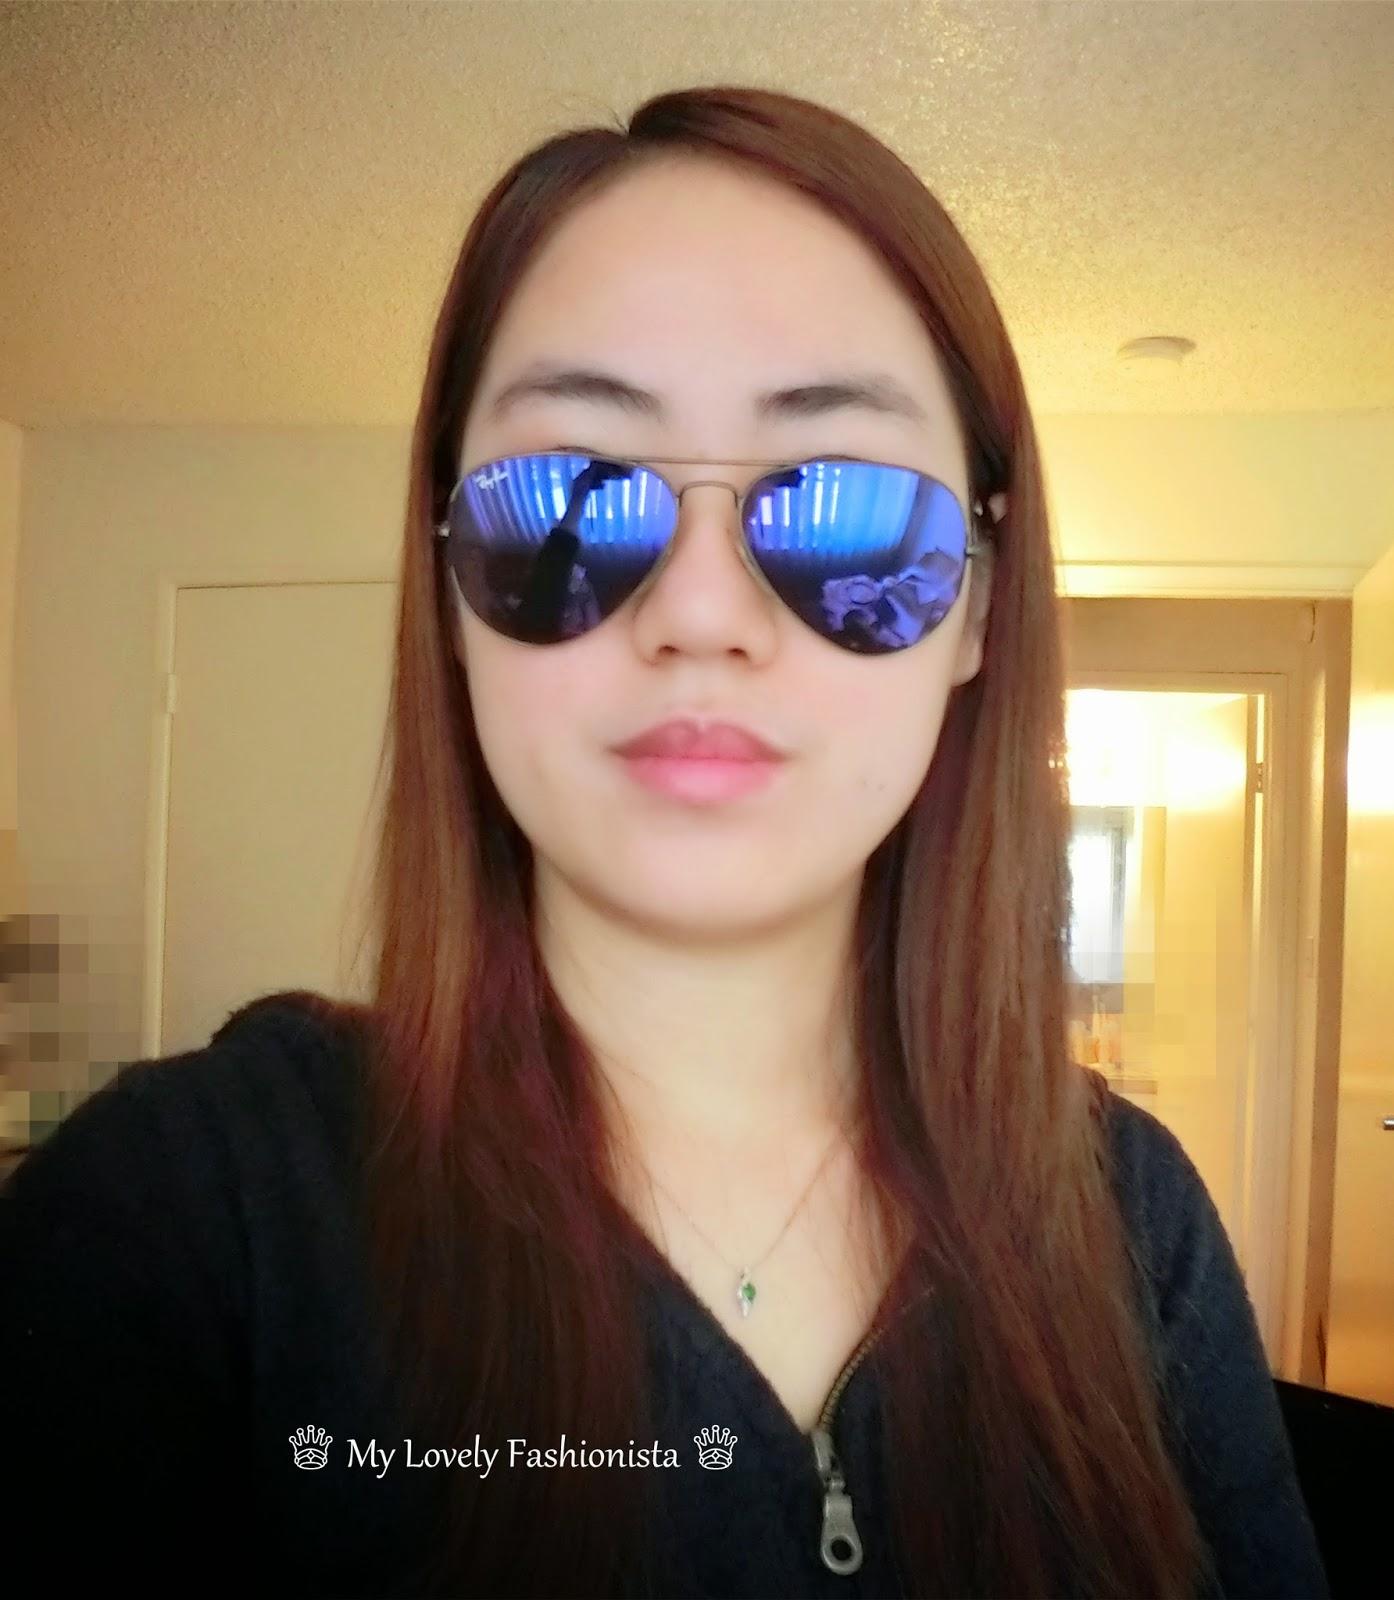 d74020c1f9 black aviator sunglasses ray ban women ... Ray-Ban Erika Sunglasses - Women  u0026 39 s